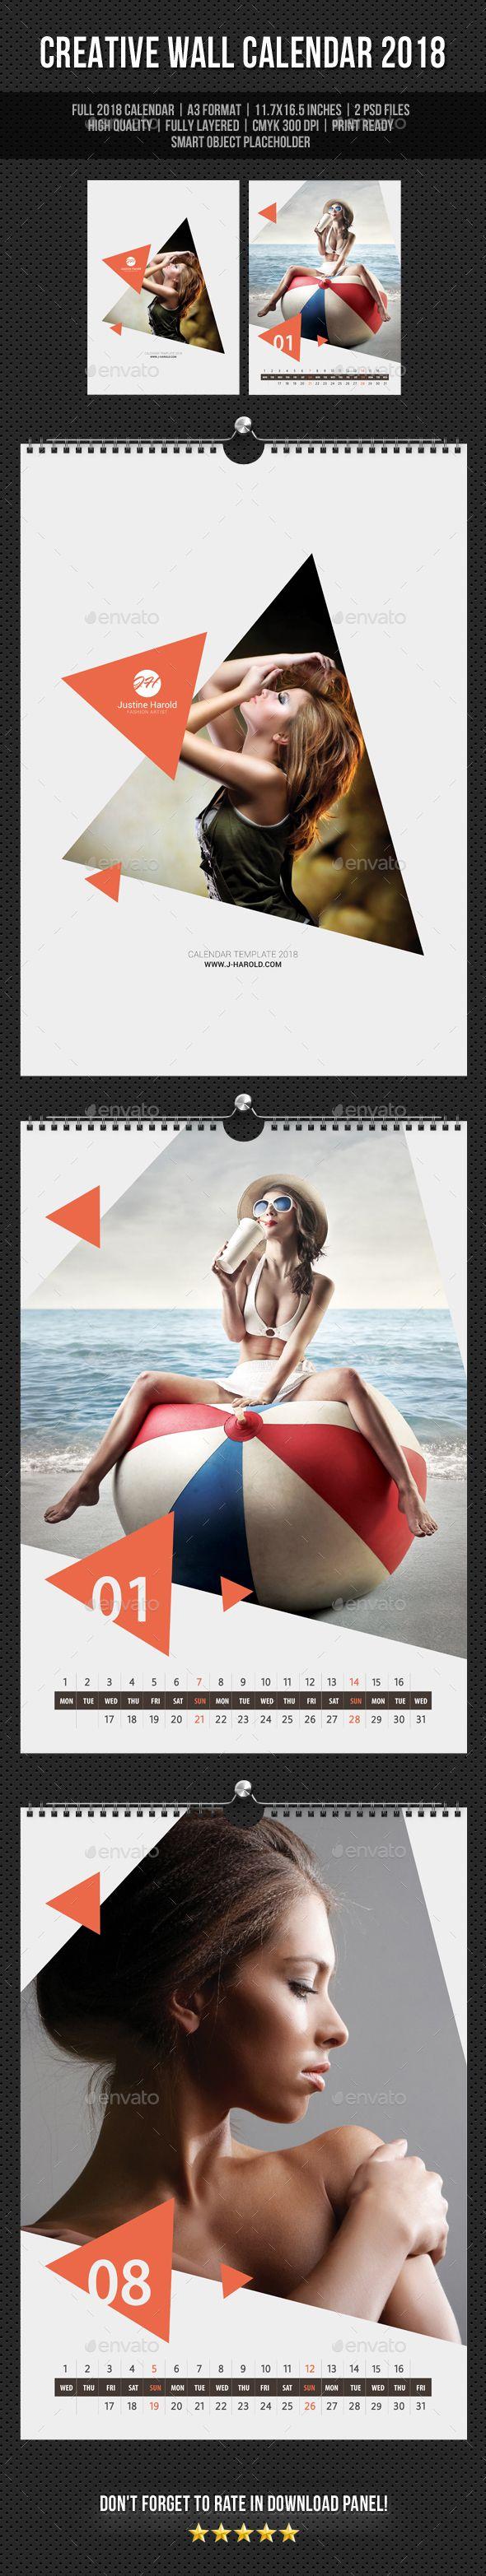 #Creative #Wall #Calendar #template #2018 V19 - Calendars Stationery #design. download: https://graphicriver.net/item/creative-wall-calendar-2018-v19/20287394?ref=yinkira